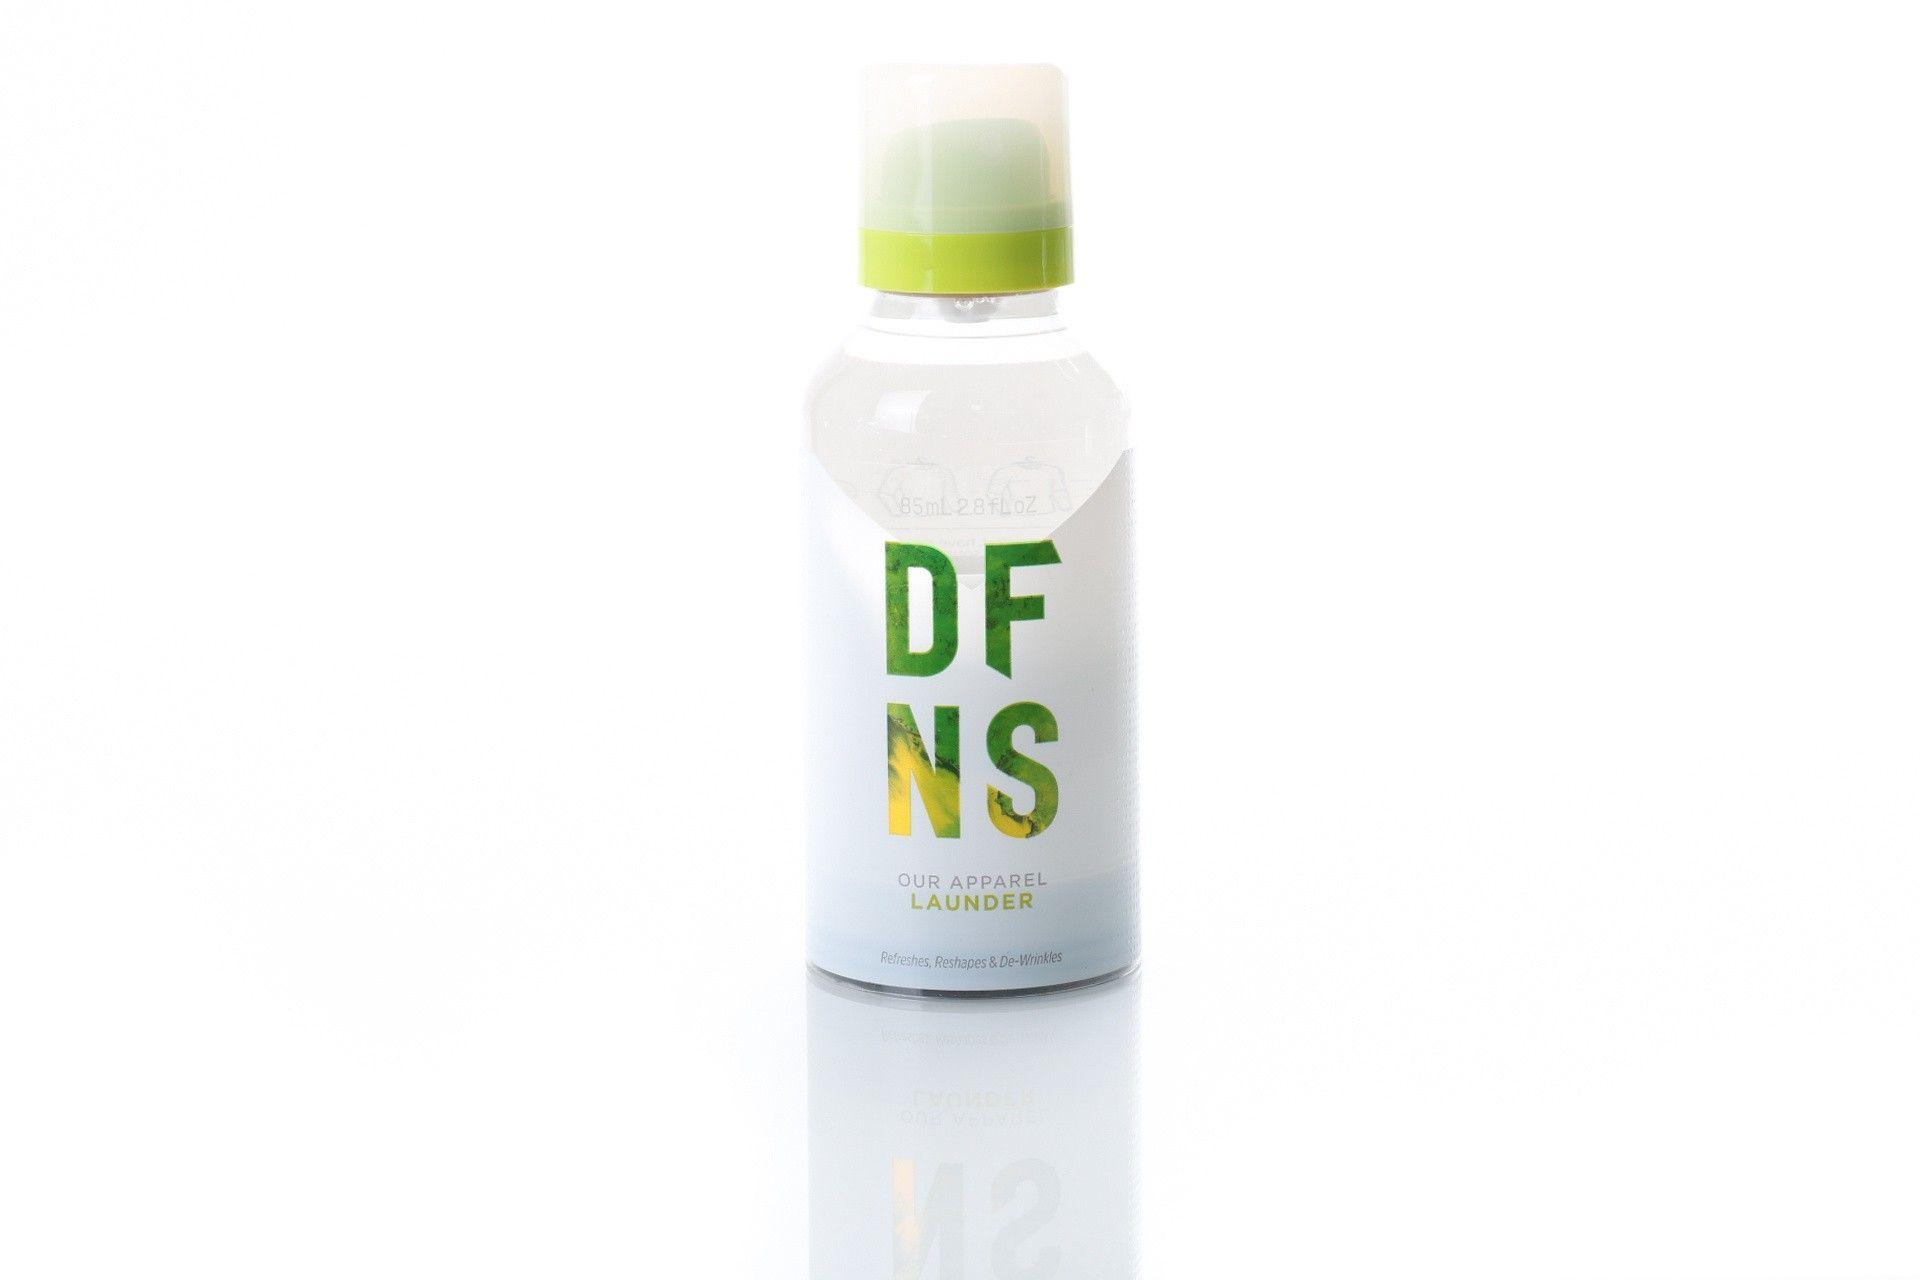 Afbeelding van DFNS Onderhoud DFNS Apparel Launder - Flight, 85 ml x 2190702